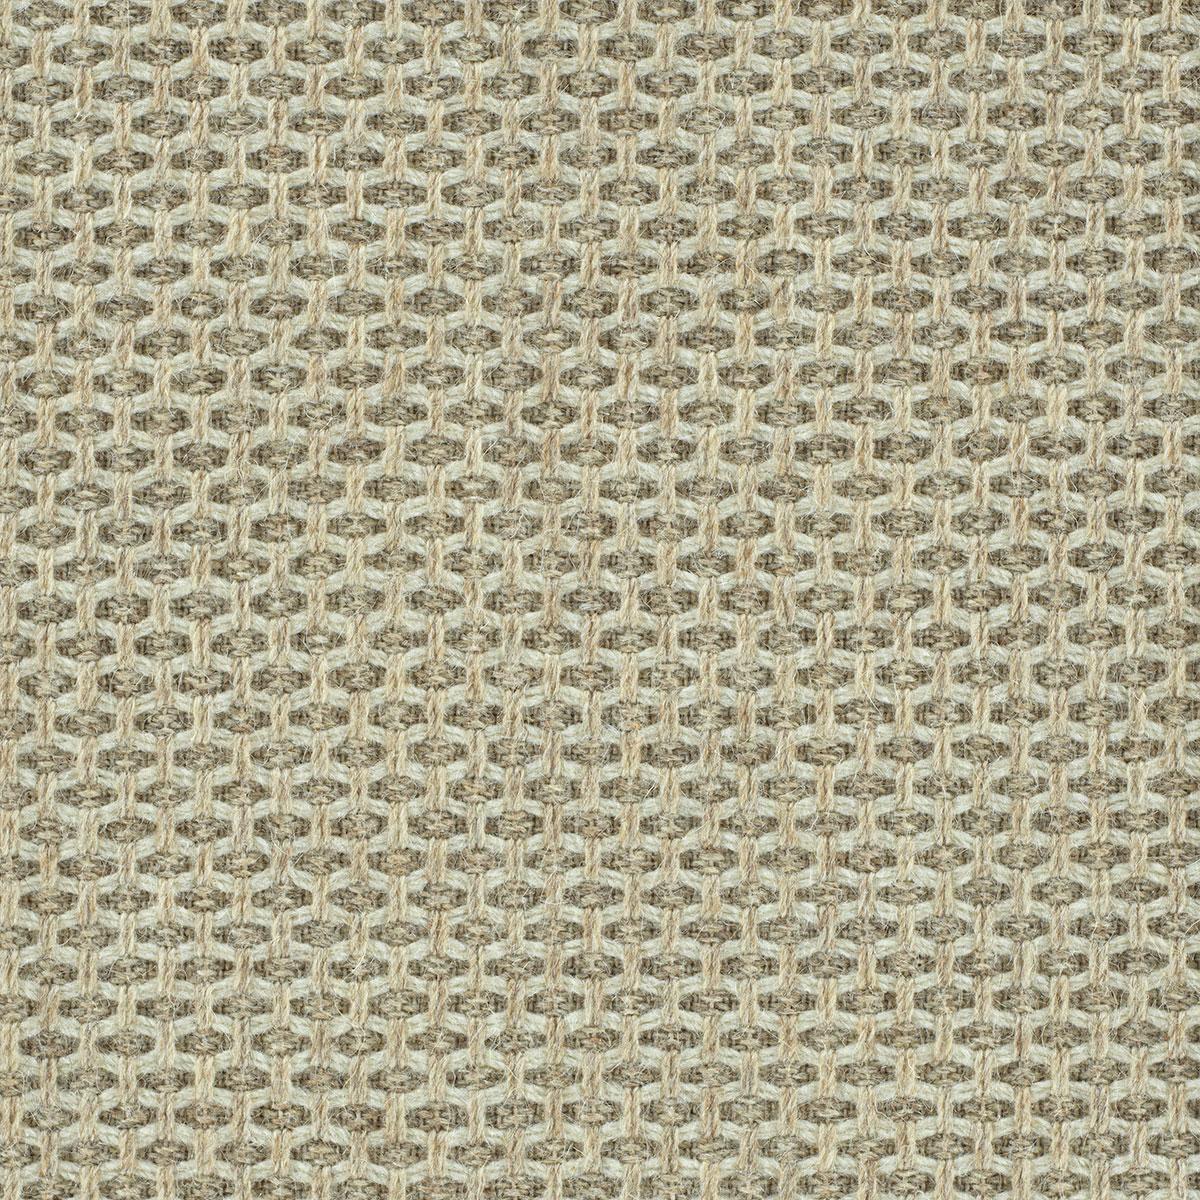 Light Beige J Mish Mills Wool Carpet Rugs